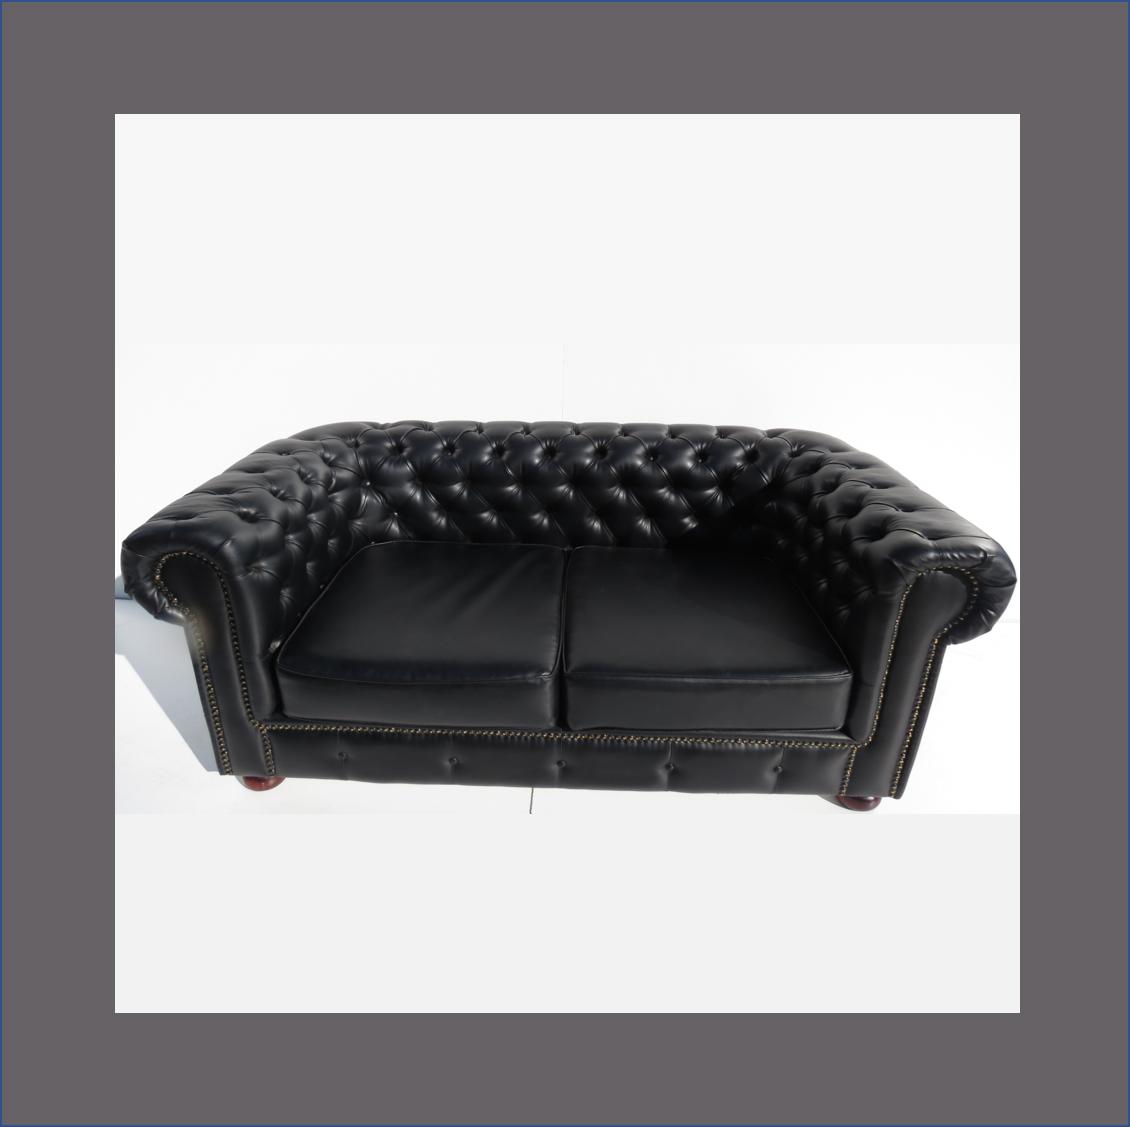 chesterfield-sofa